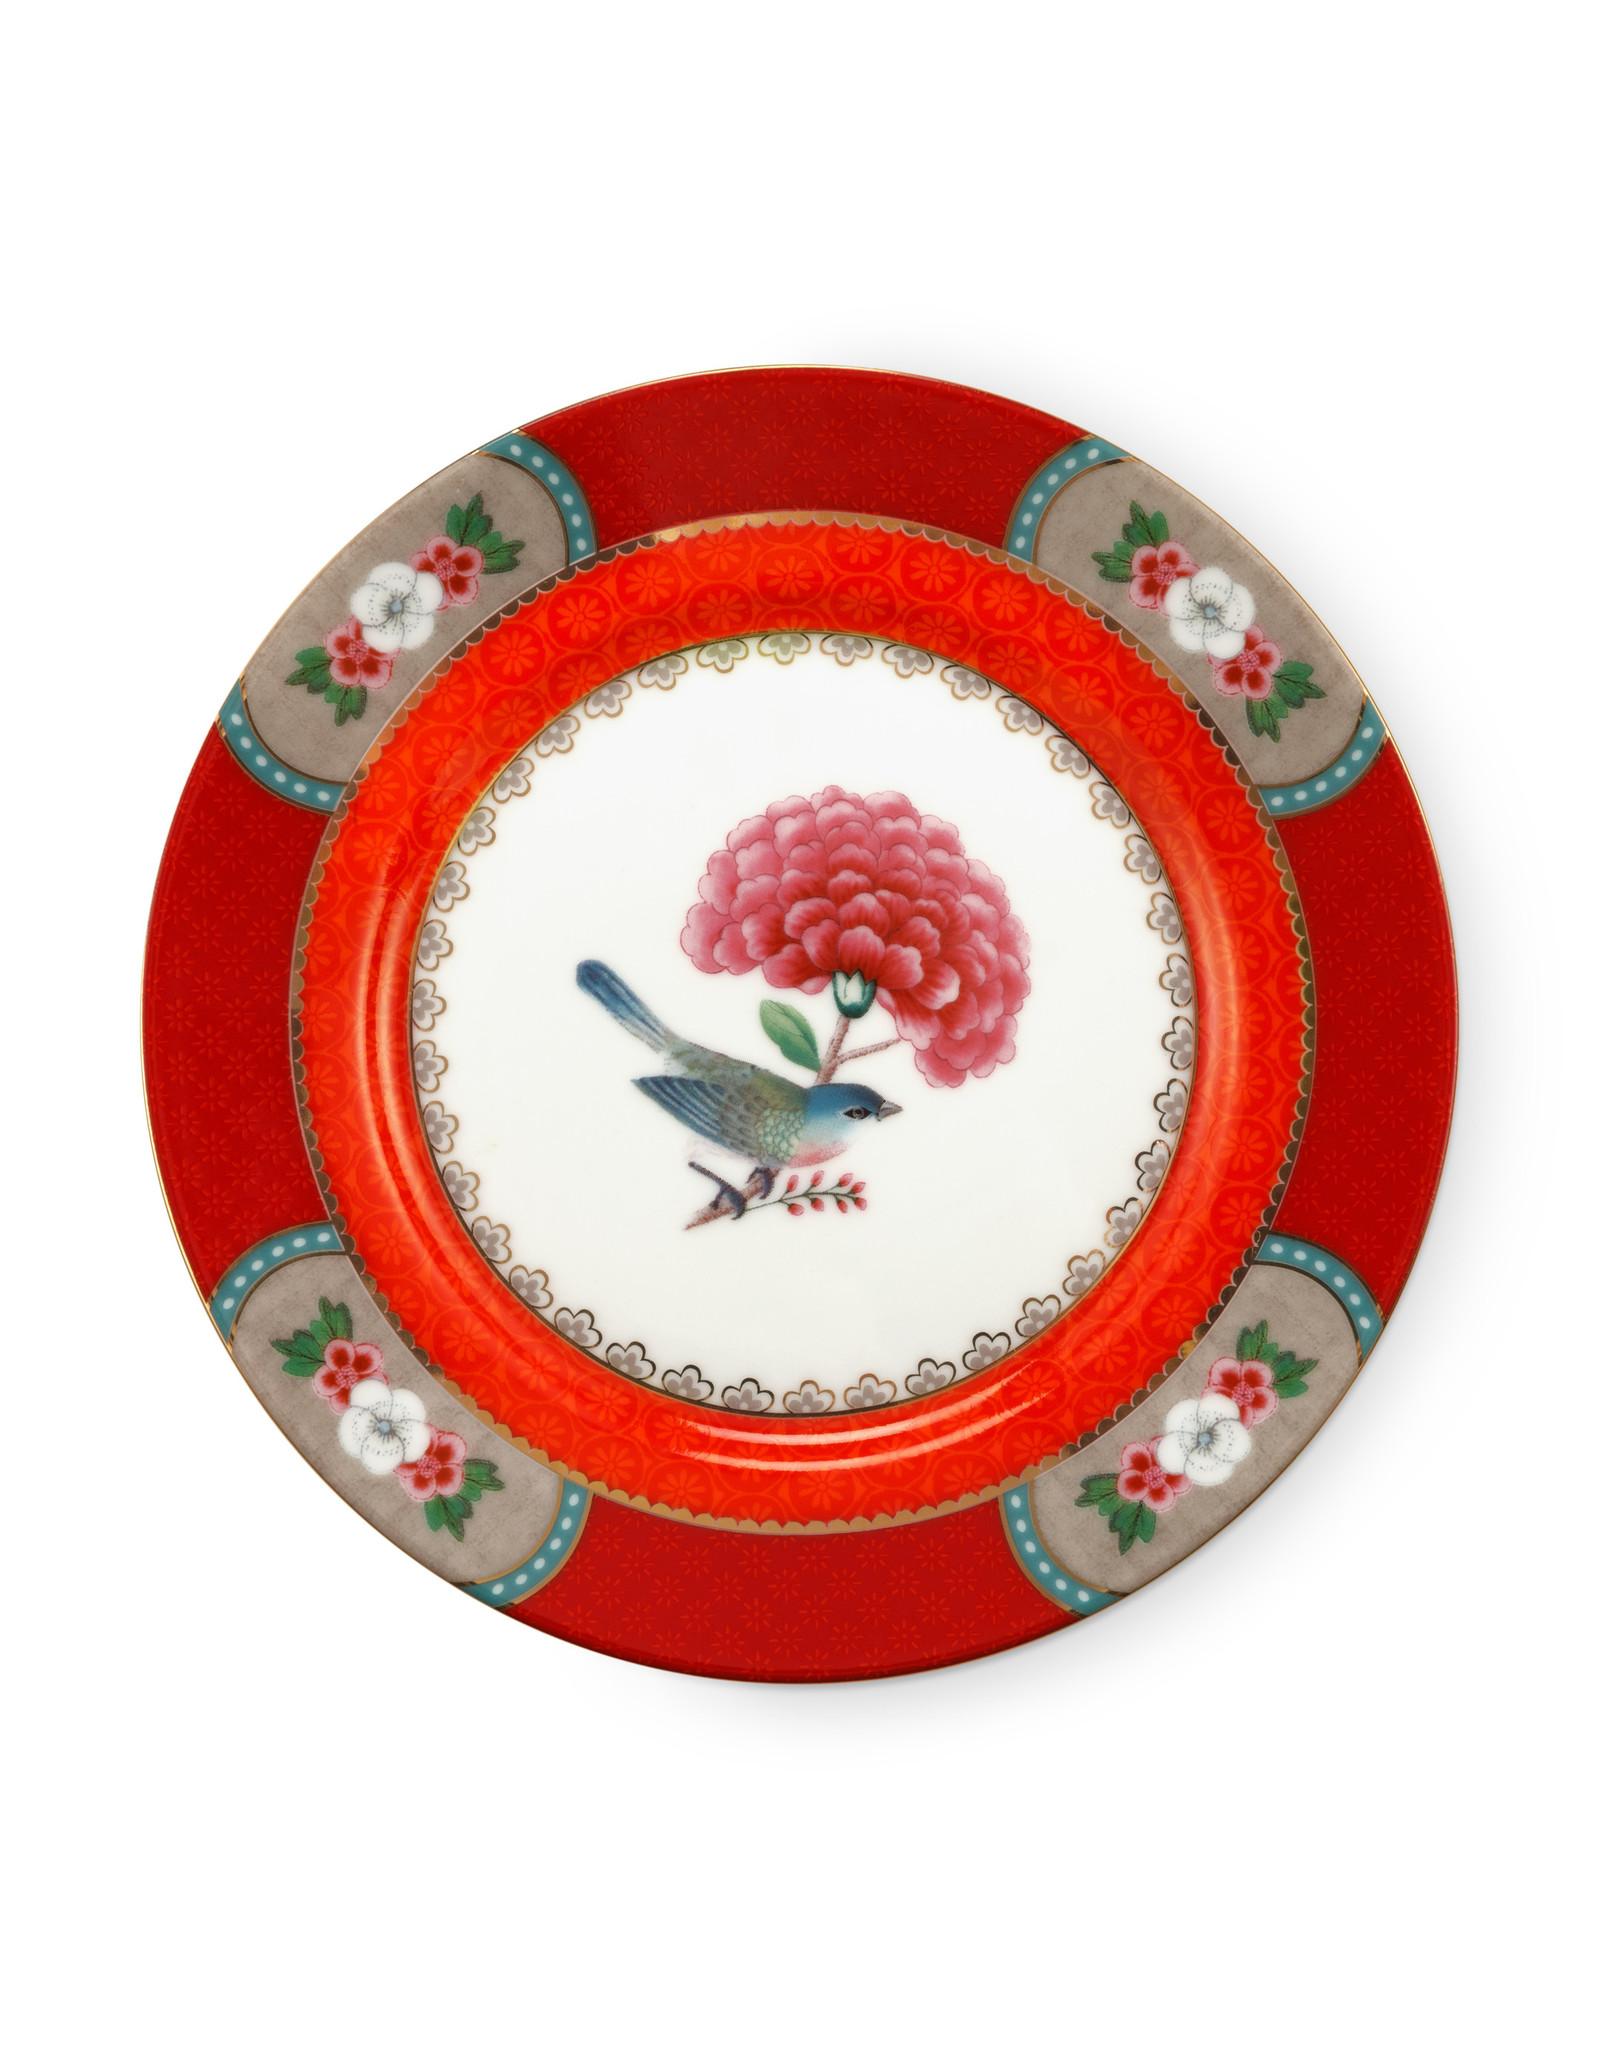 pip studio Plate Blushing birds red 17cm